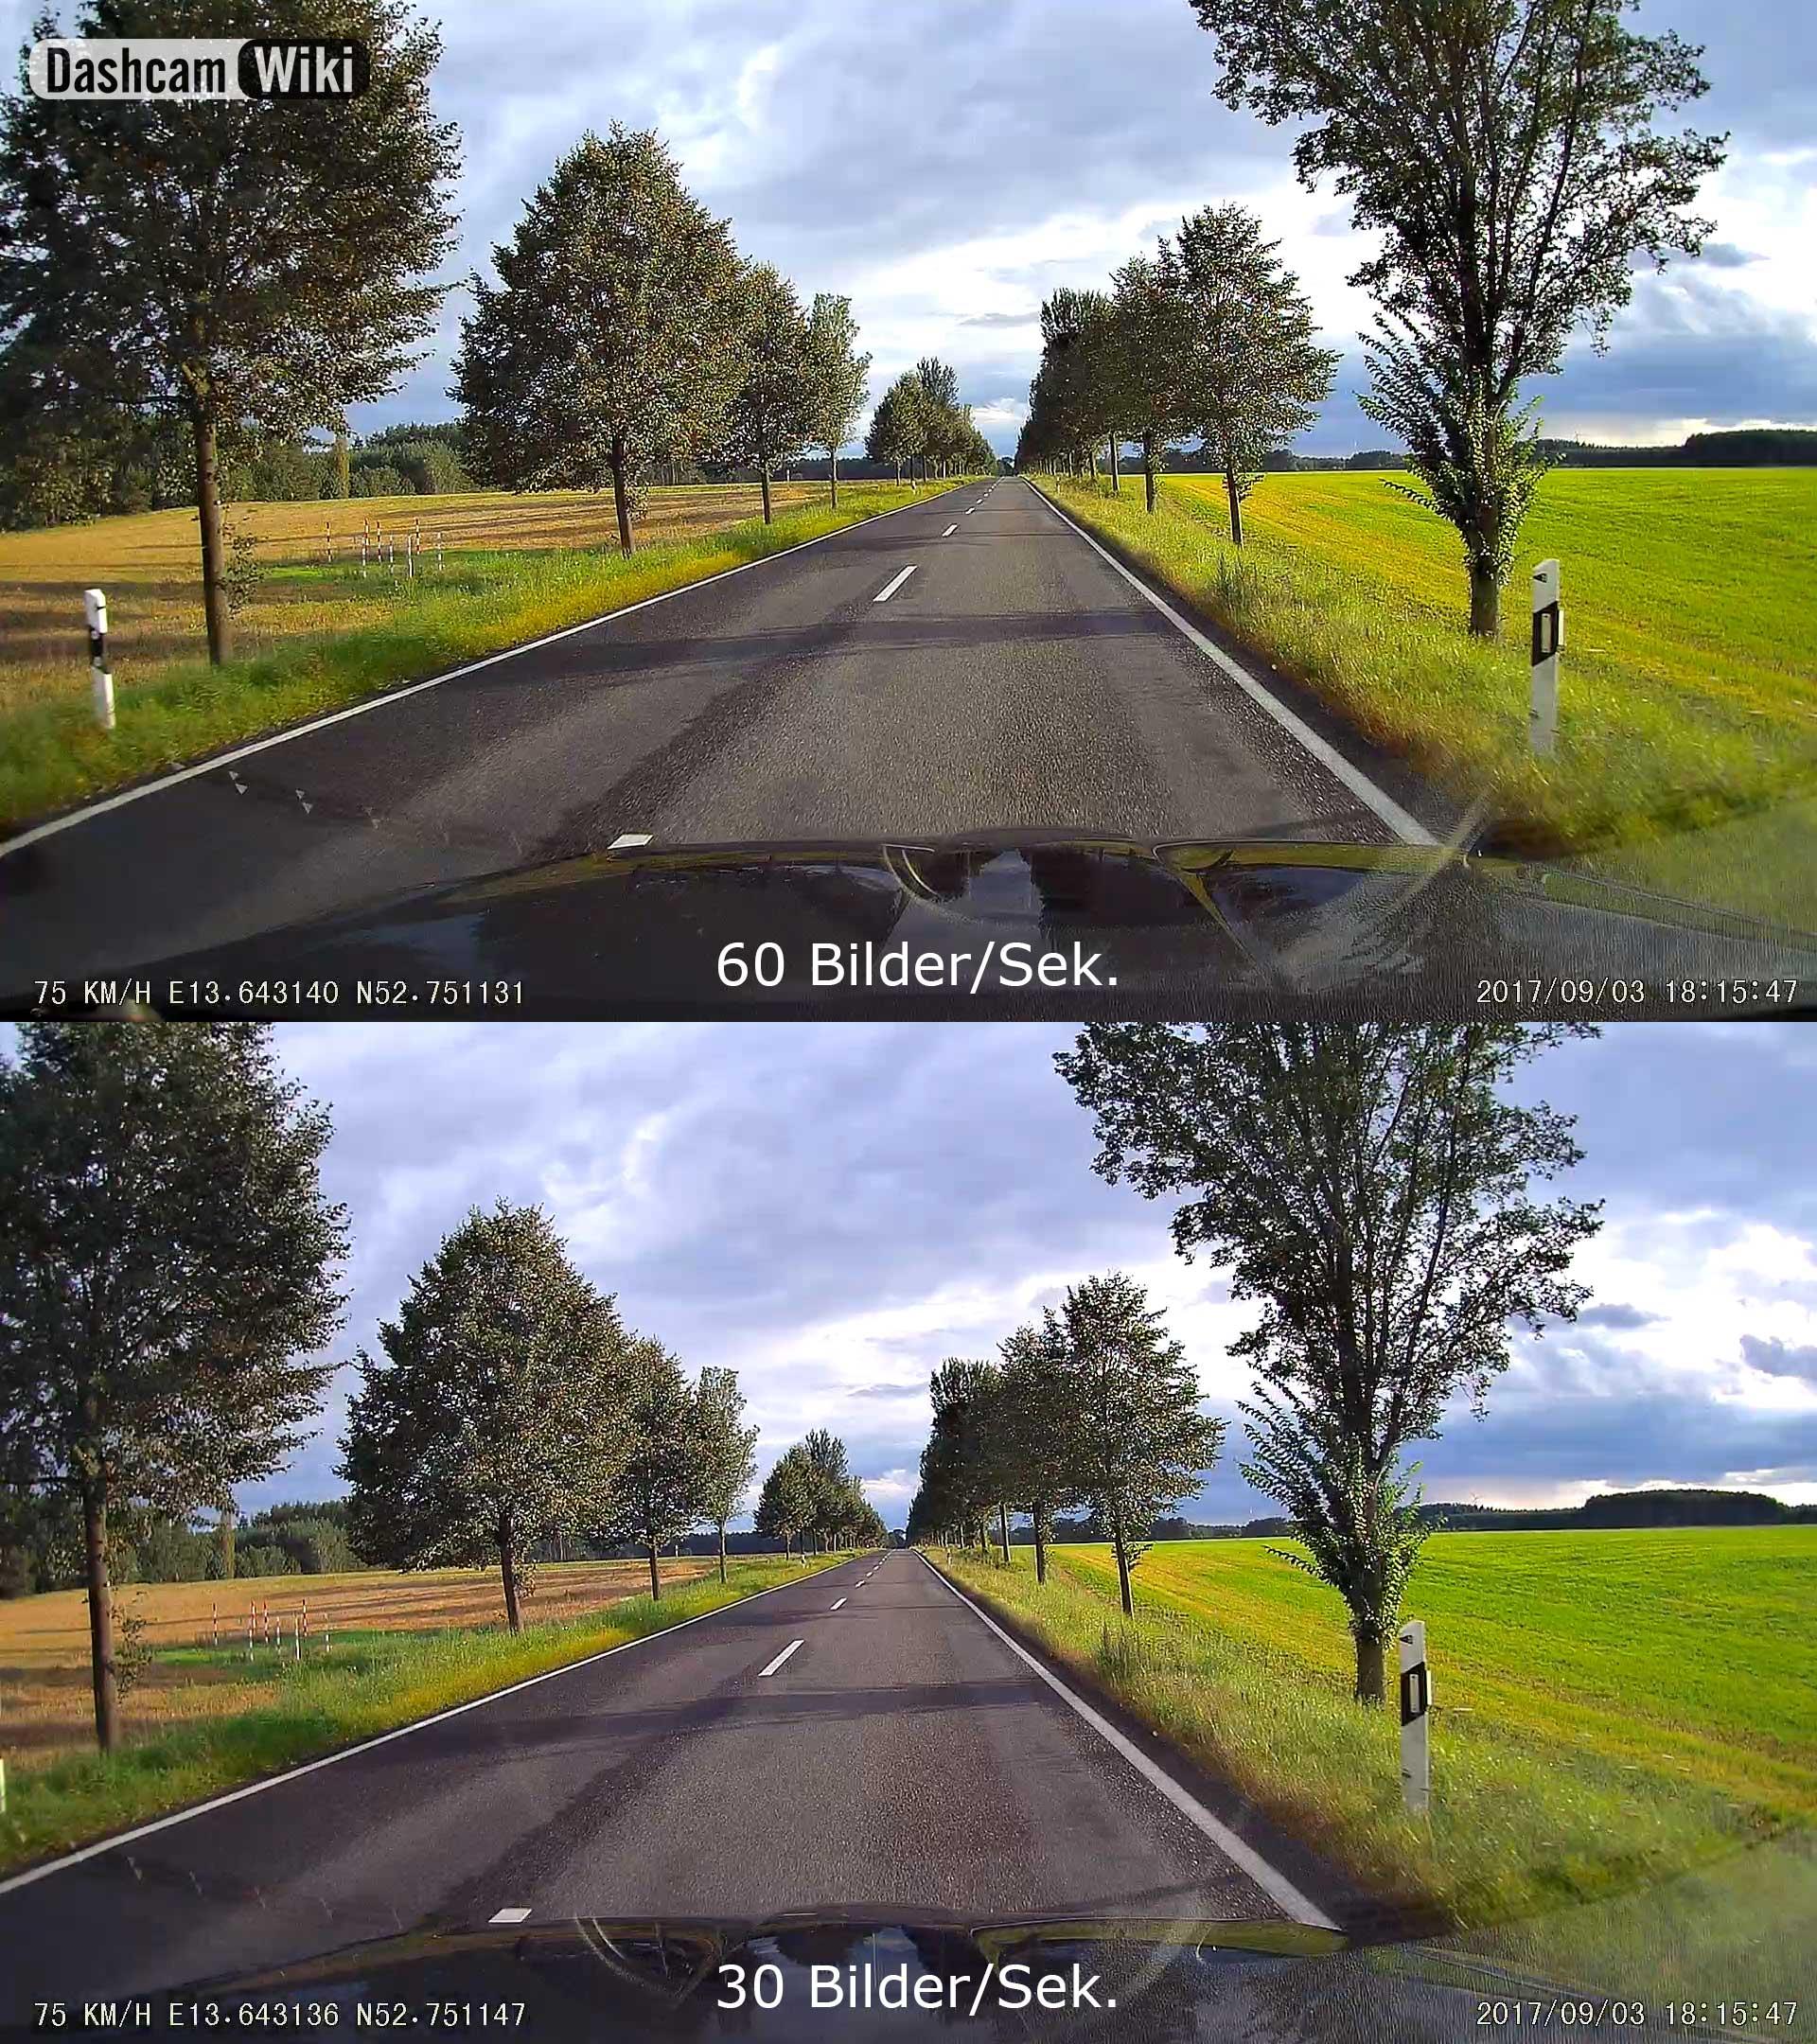 Screenshot Vergleich - Bild 4